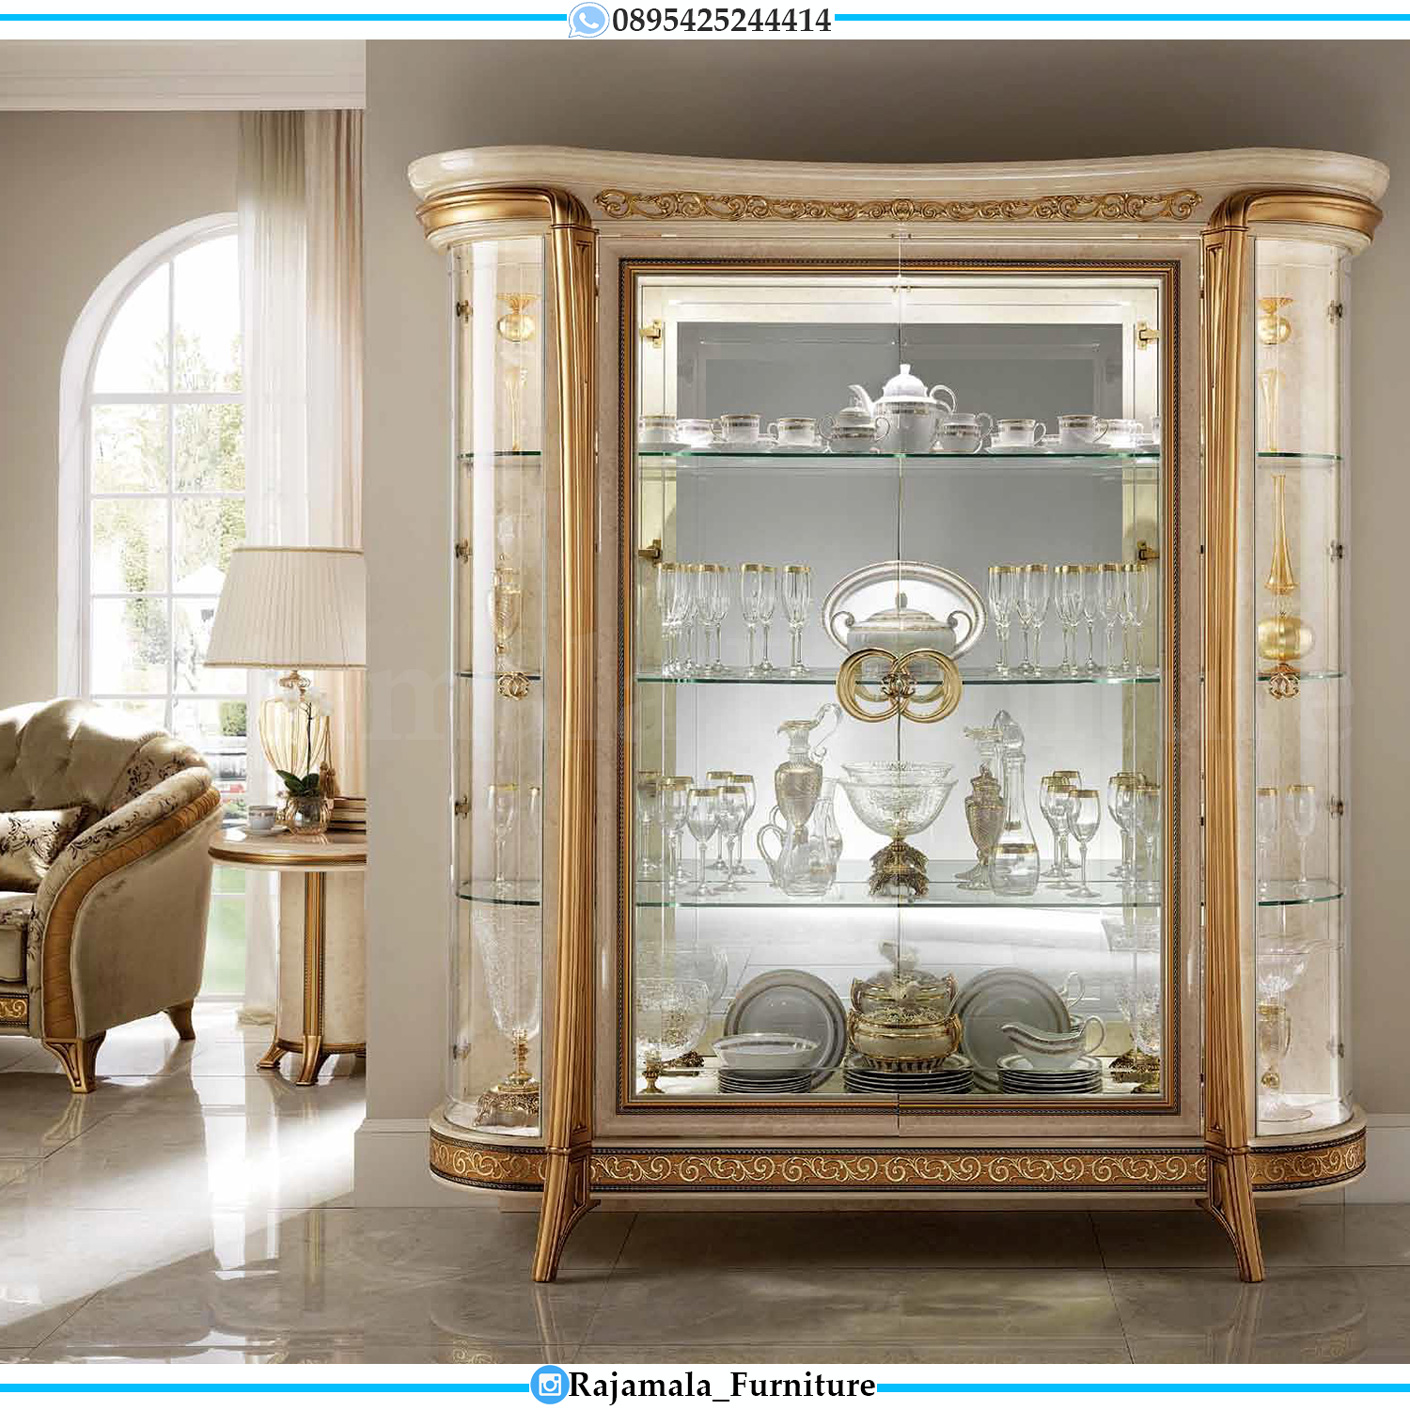 Lemari Hias Mewah Kaca Luxury Type Italian Baroque RM-0033